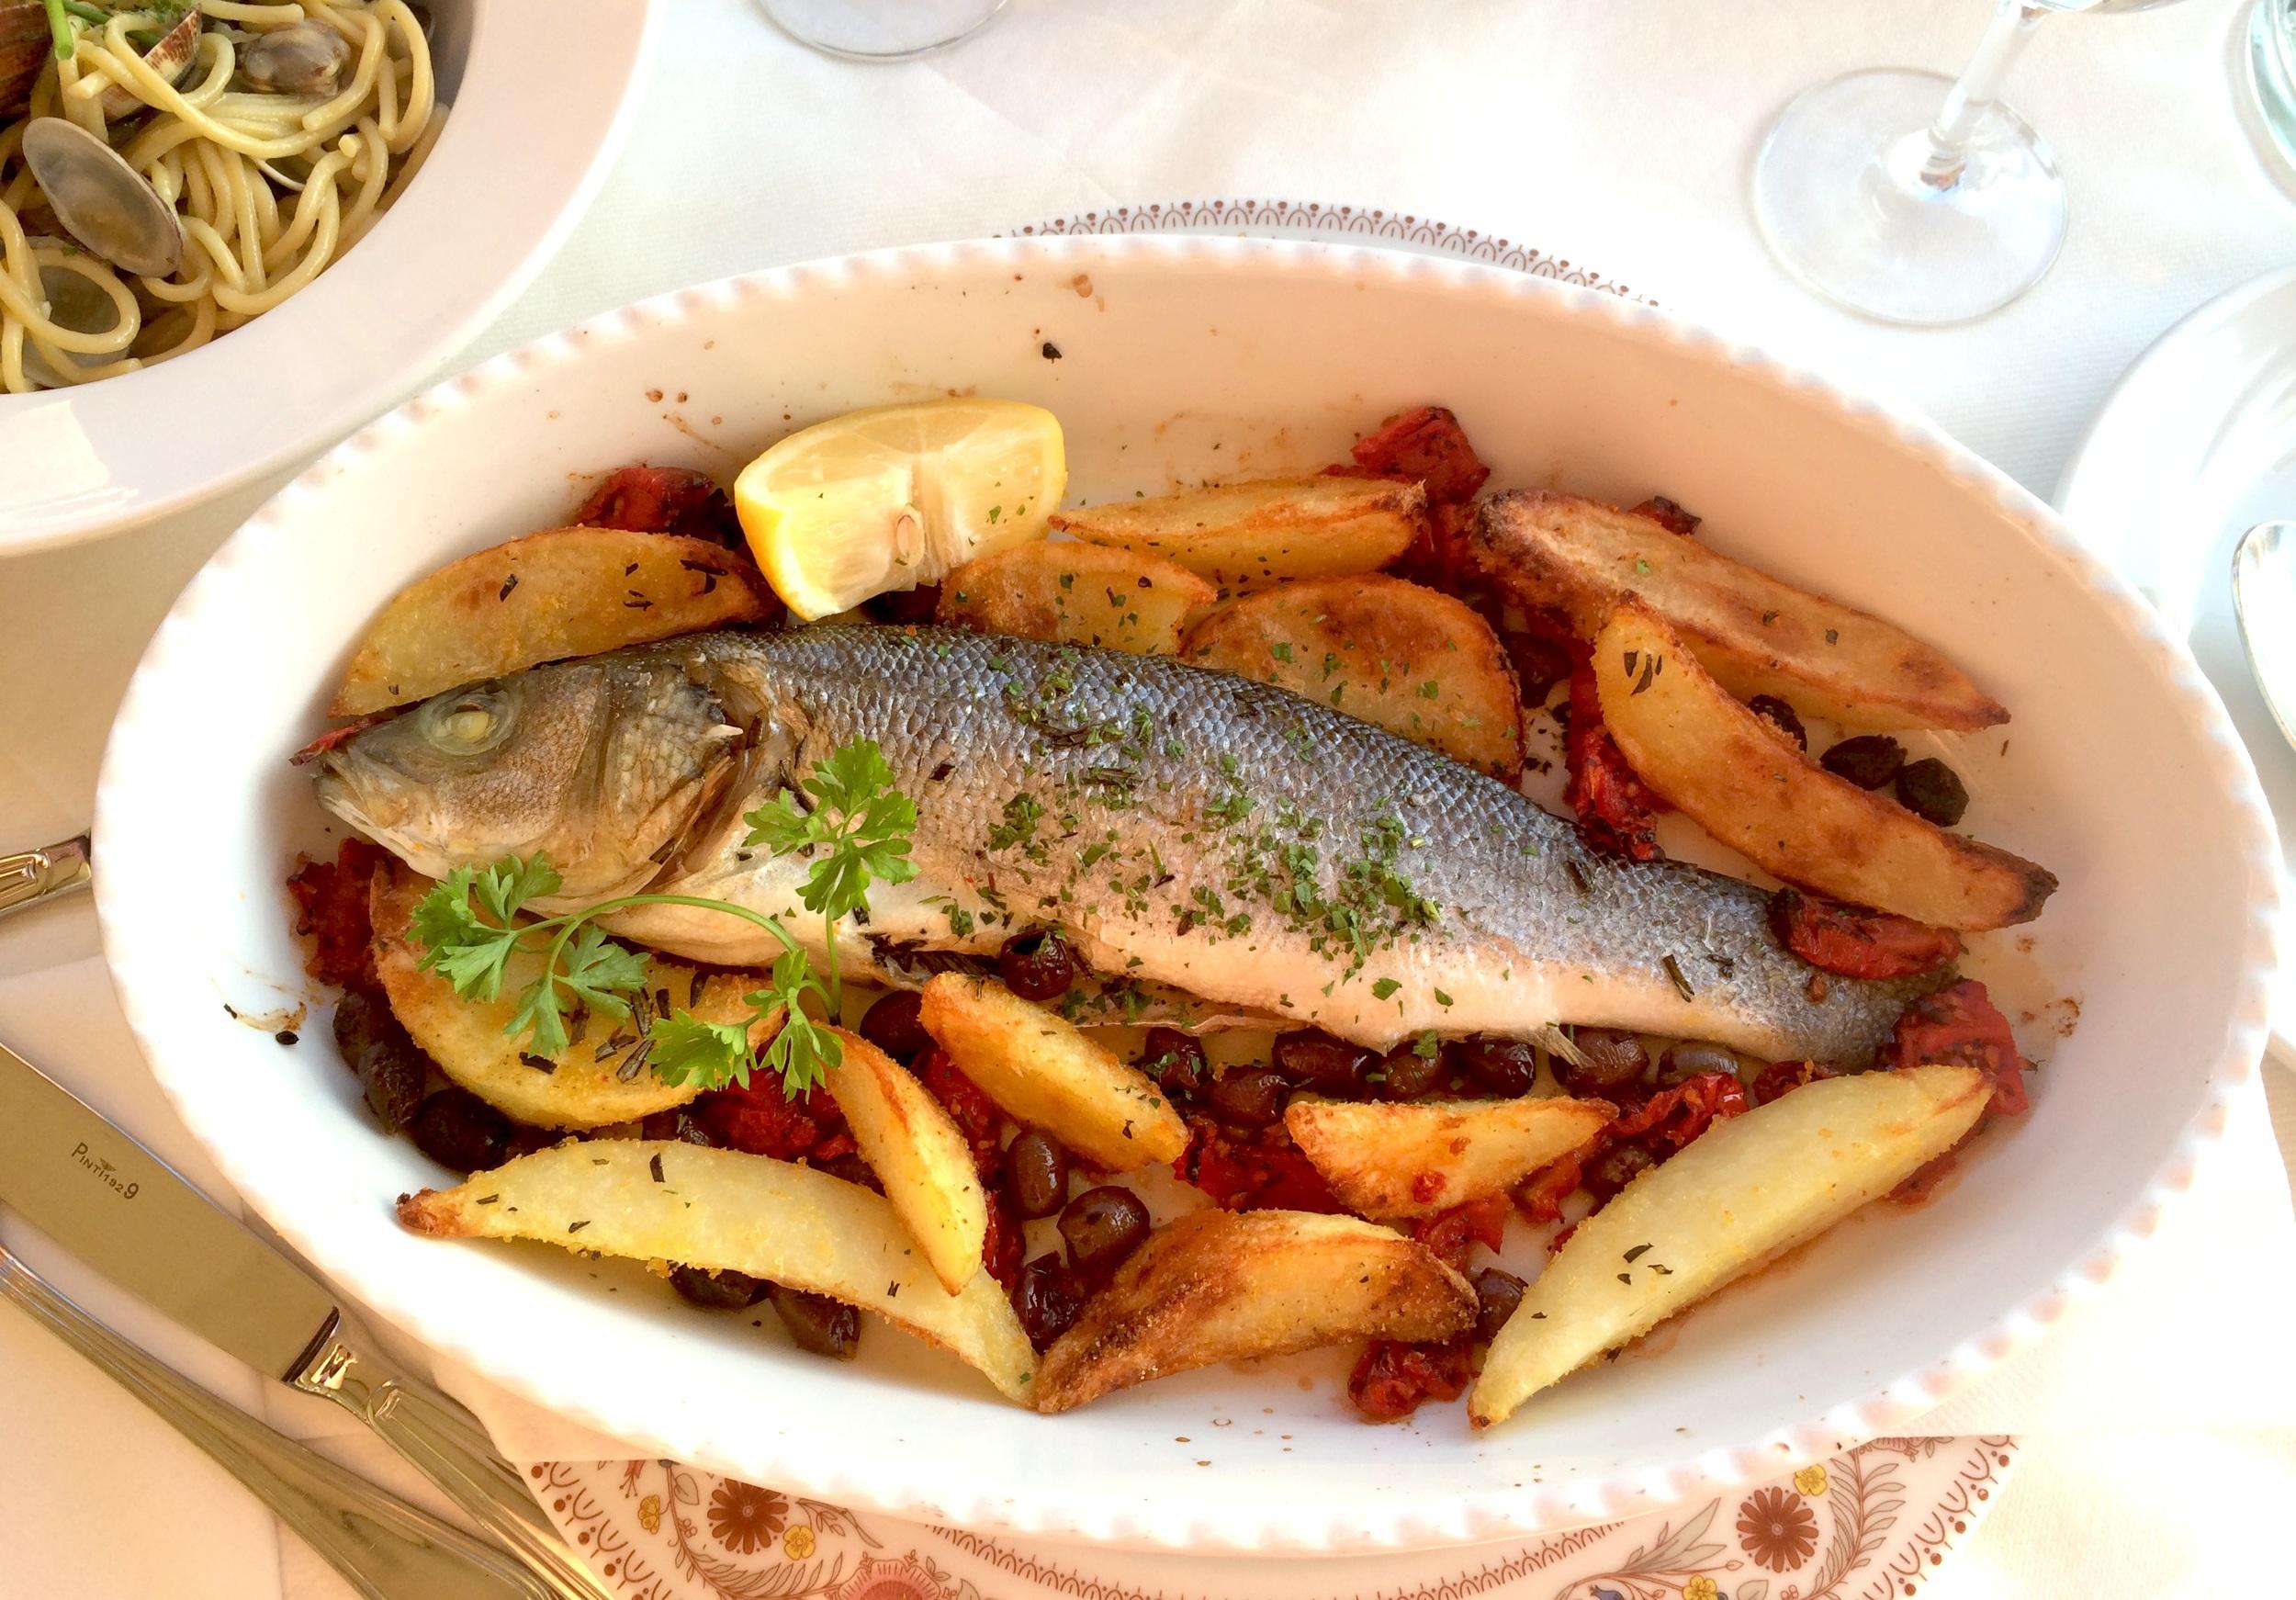 My sea bass roast with potatoes and sun-dried tomatoes